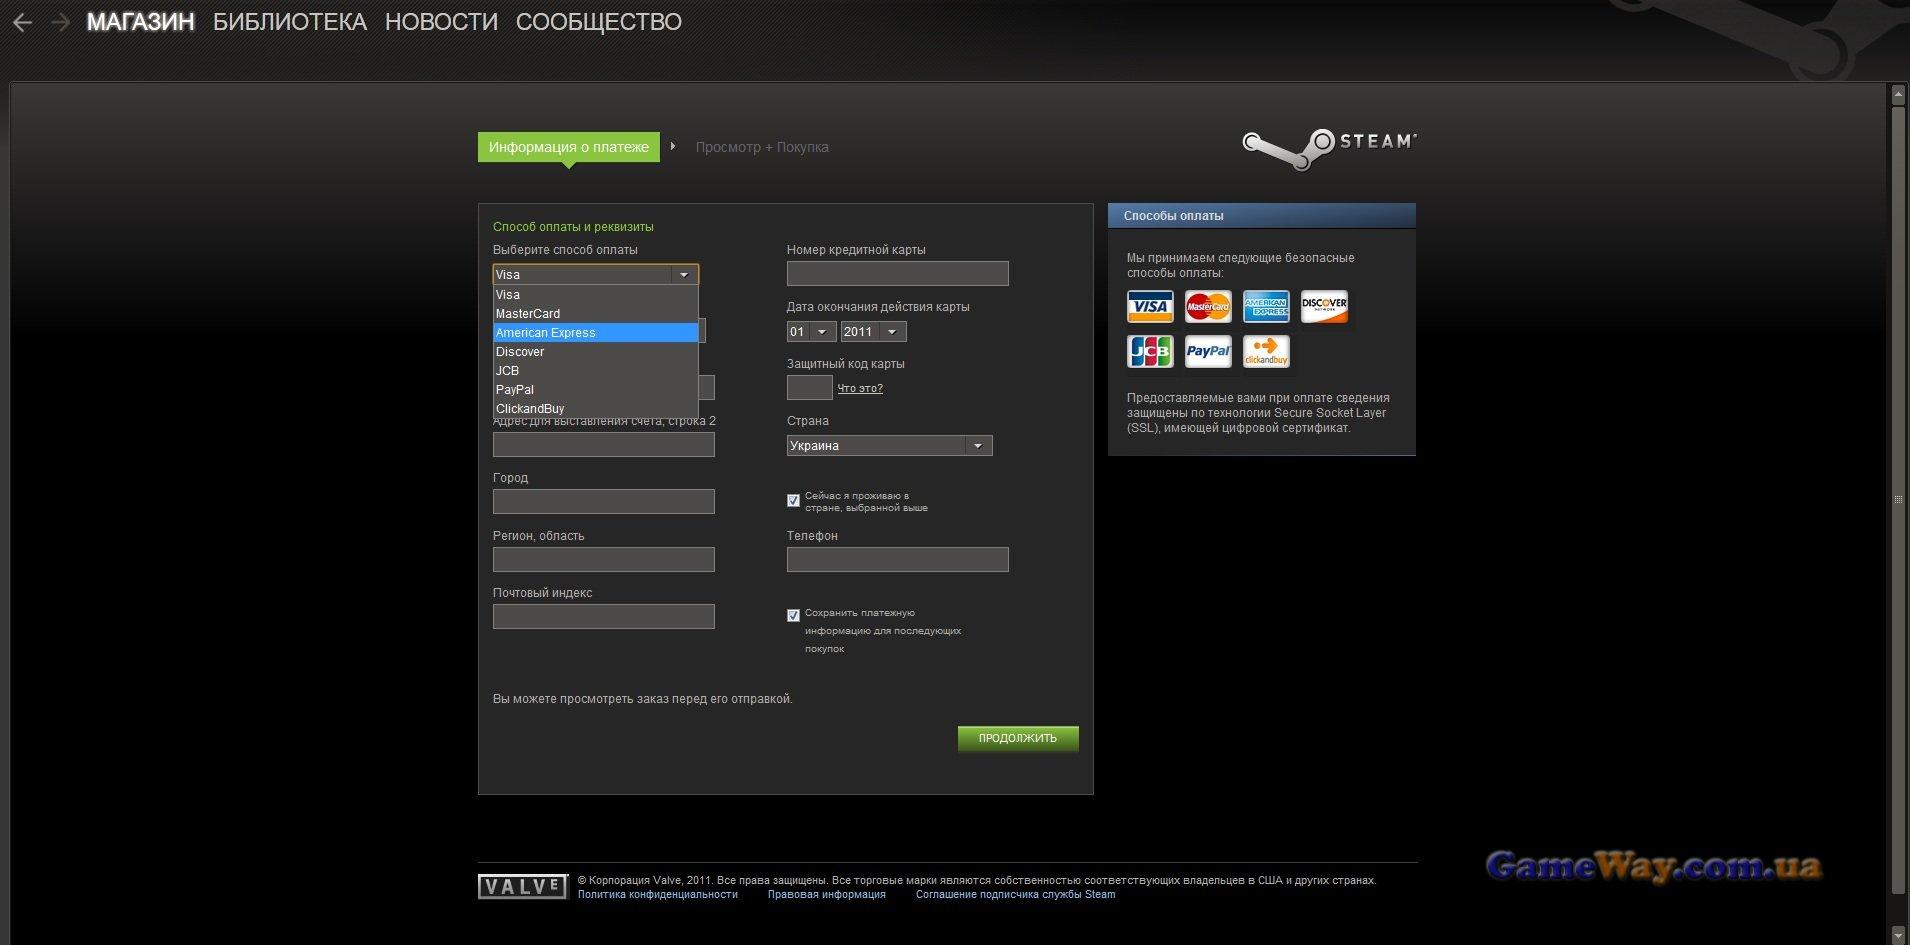 Как купить cs go в steam через mastercard play counter strike 1 6 online